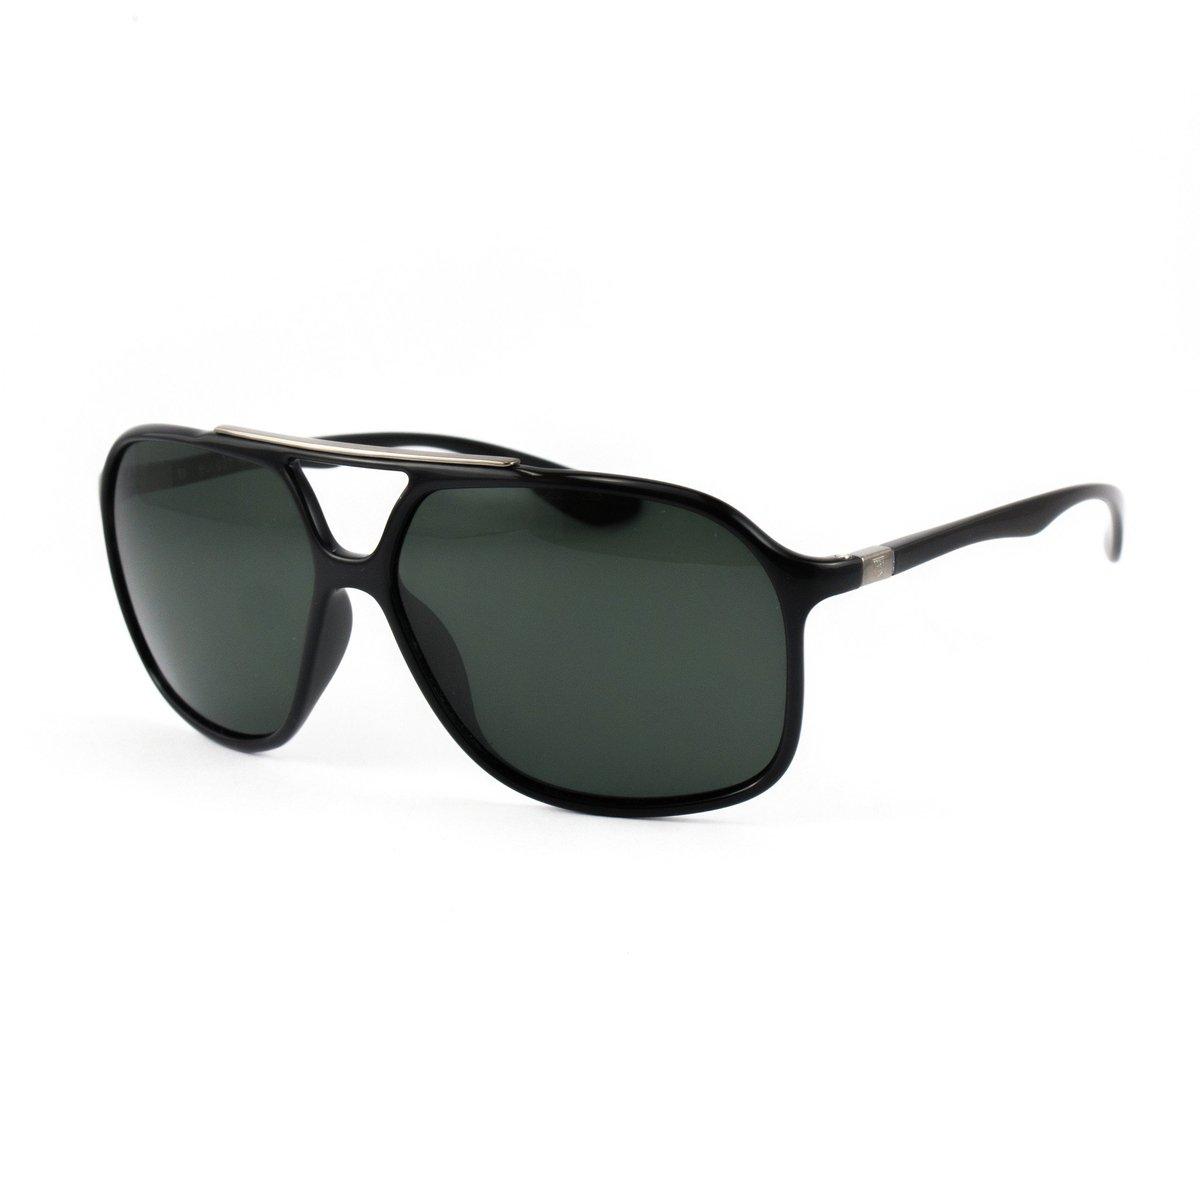 a0a3a243adf64 Óculos Bulget De Sol Polarizado - Compre Agora